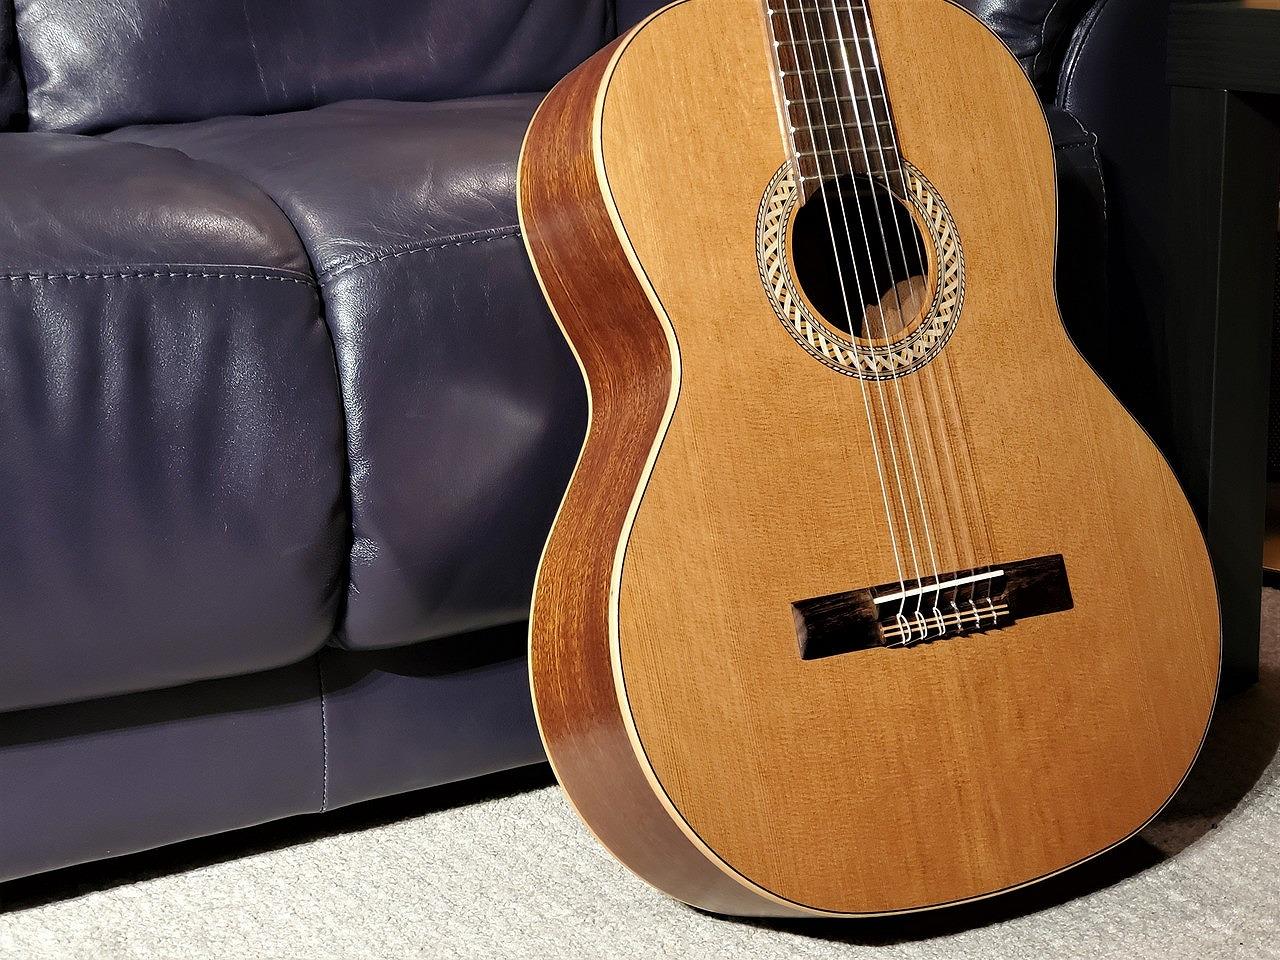 Orpheus Valley Guitars Sofia SC 【かなりの高コストパフォーマンス!】【総単板仕様】【最大42回まで無金利分割対象品!】【名古屋店】